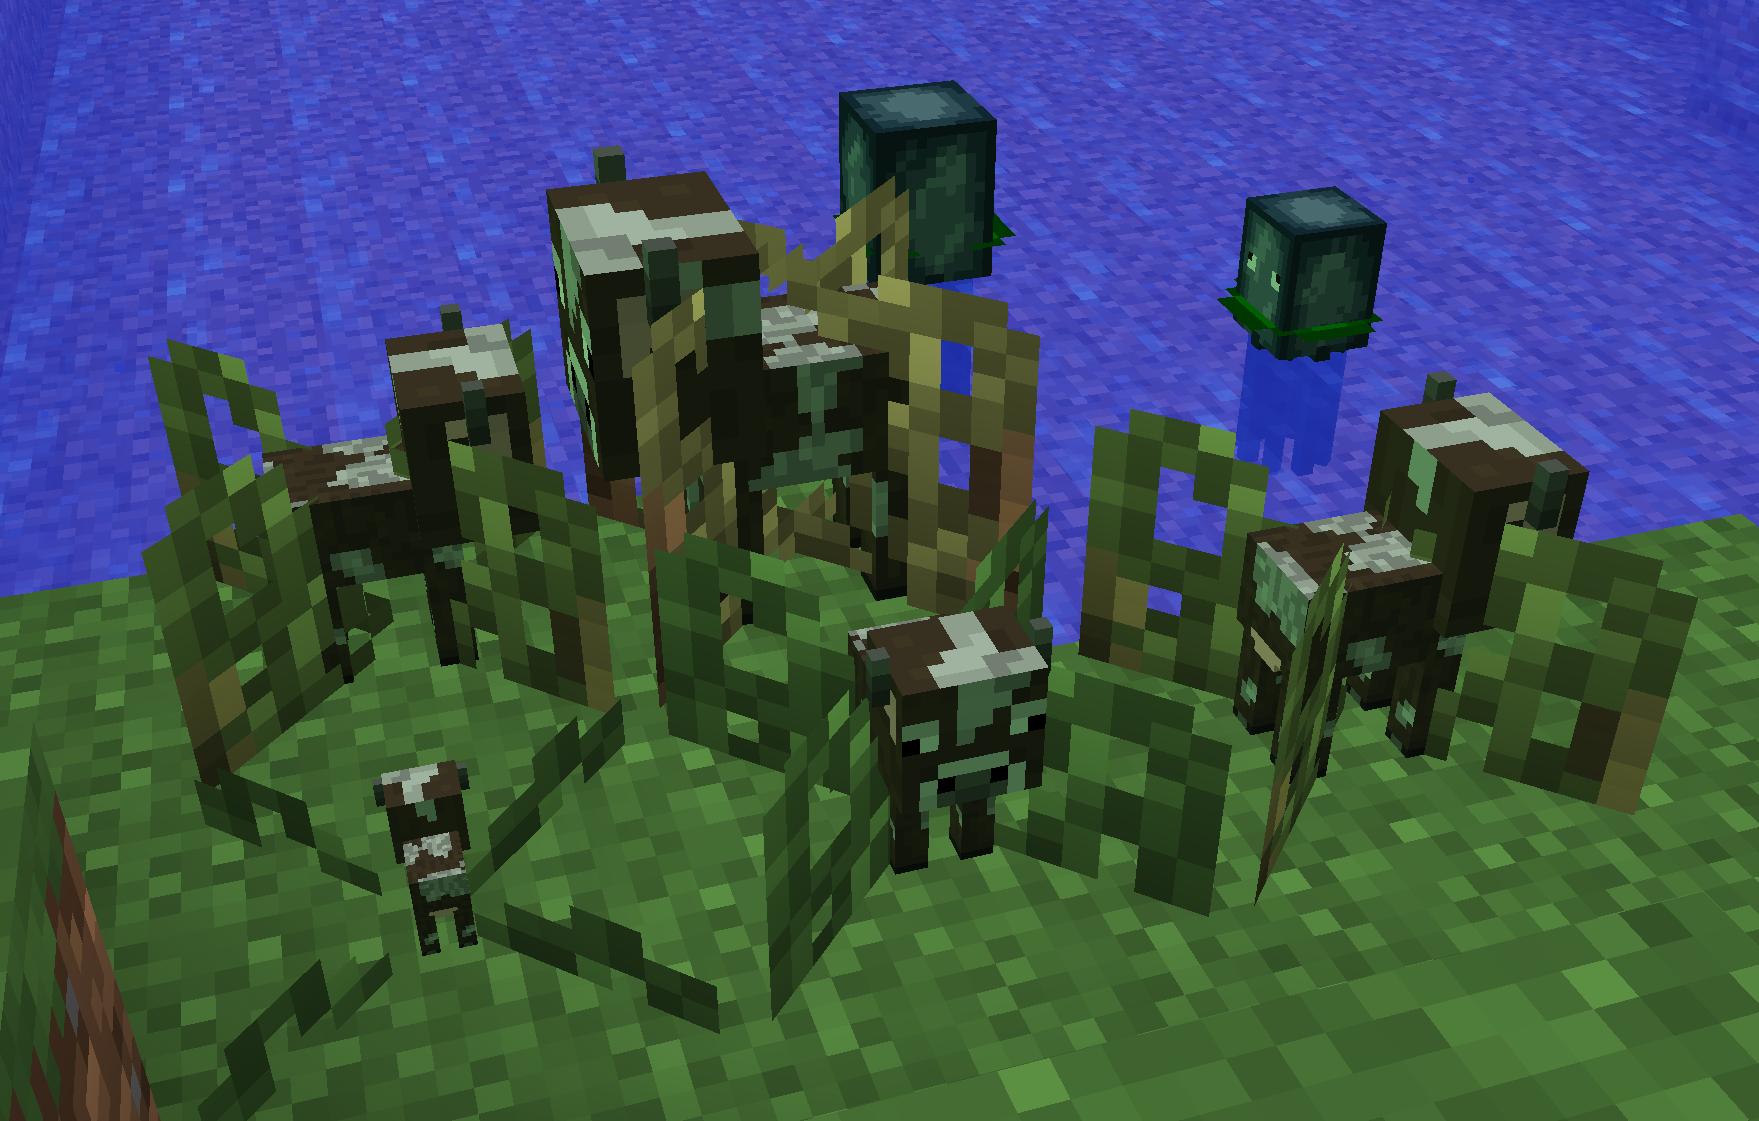 Cow crops growing